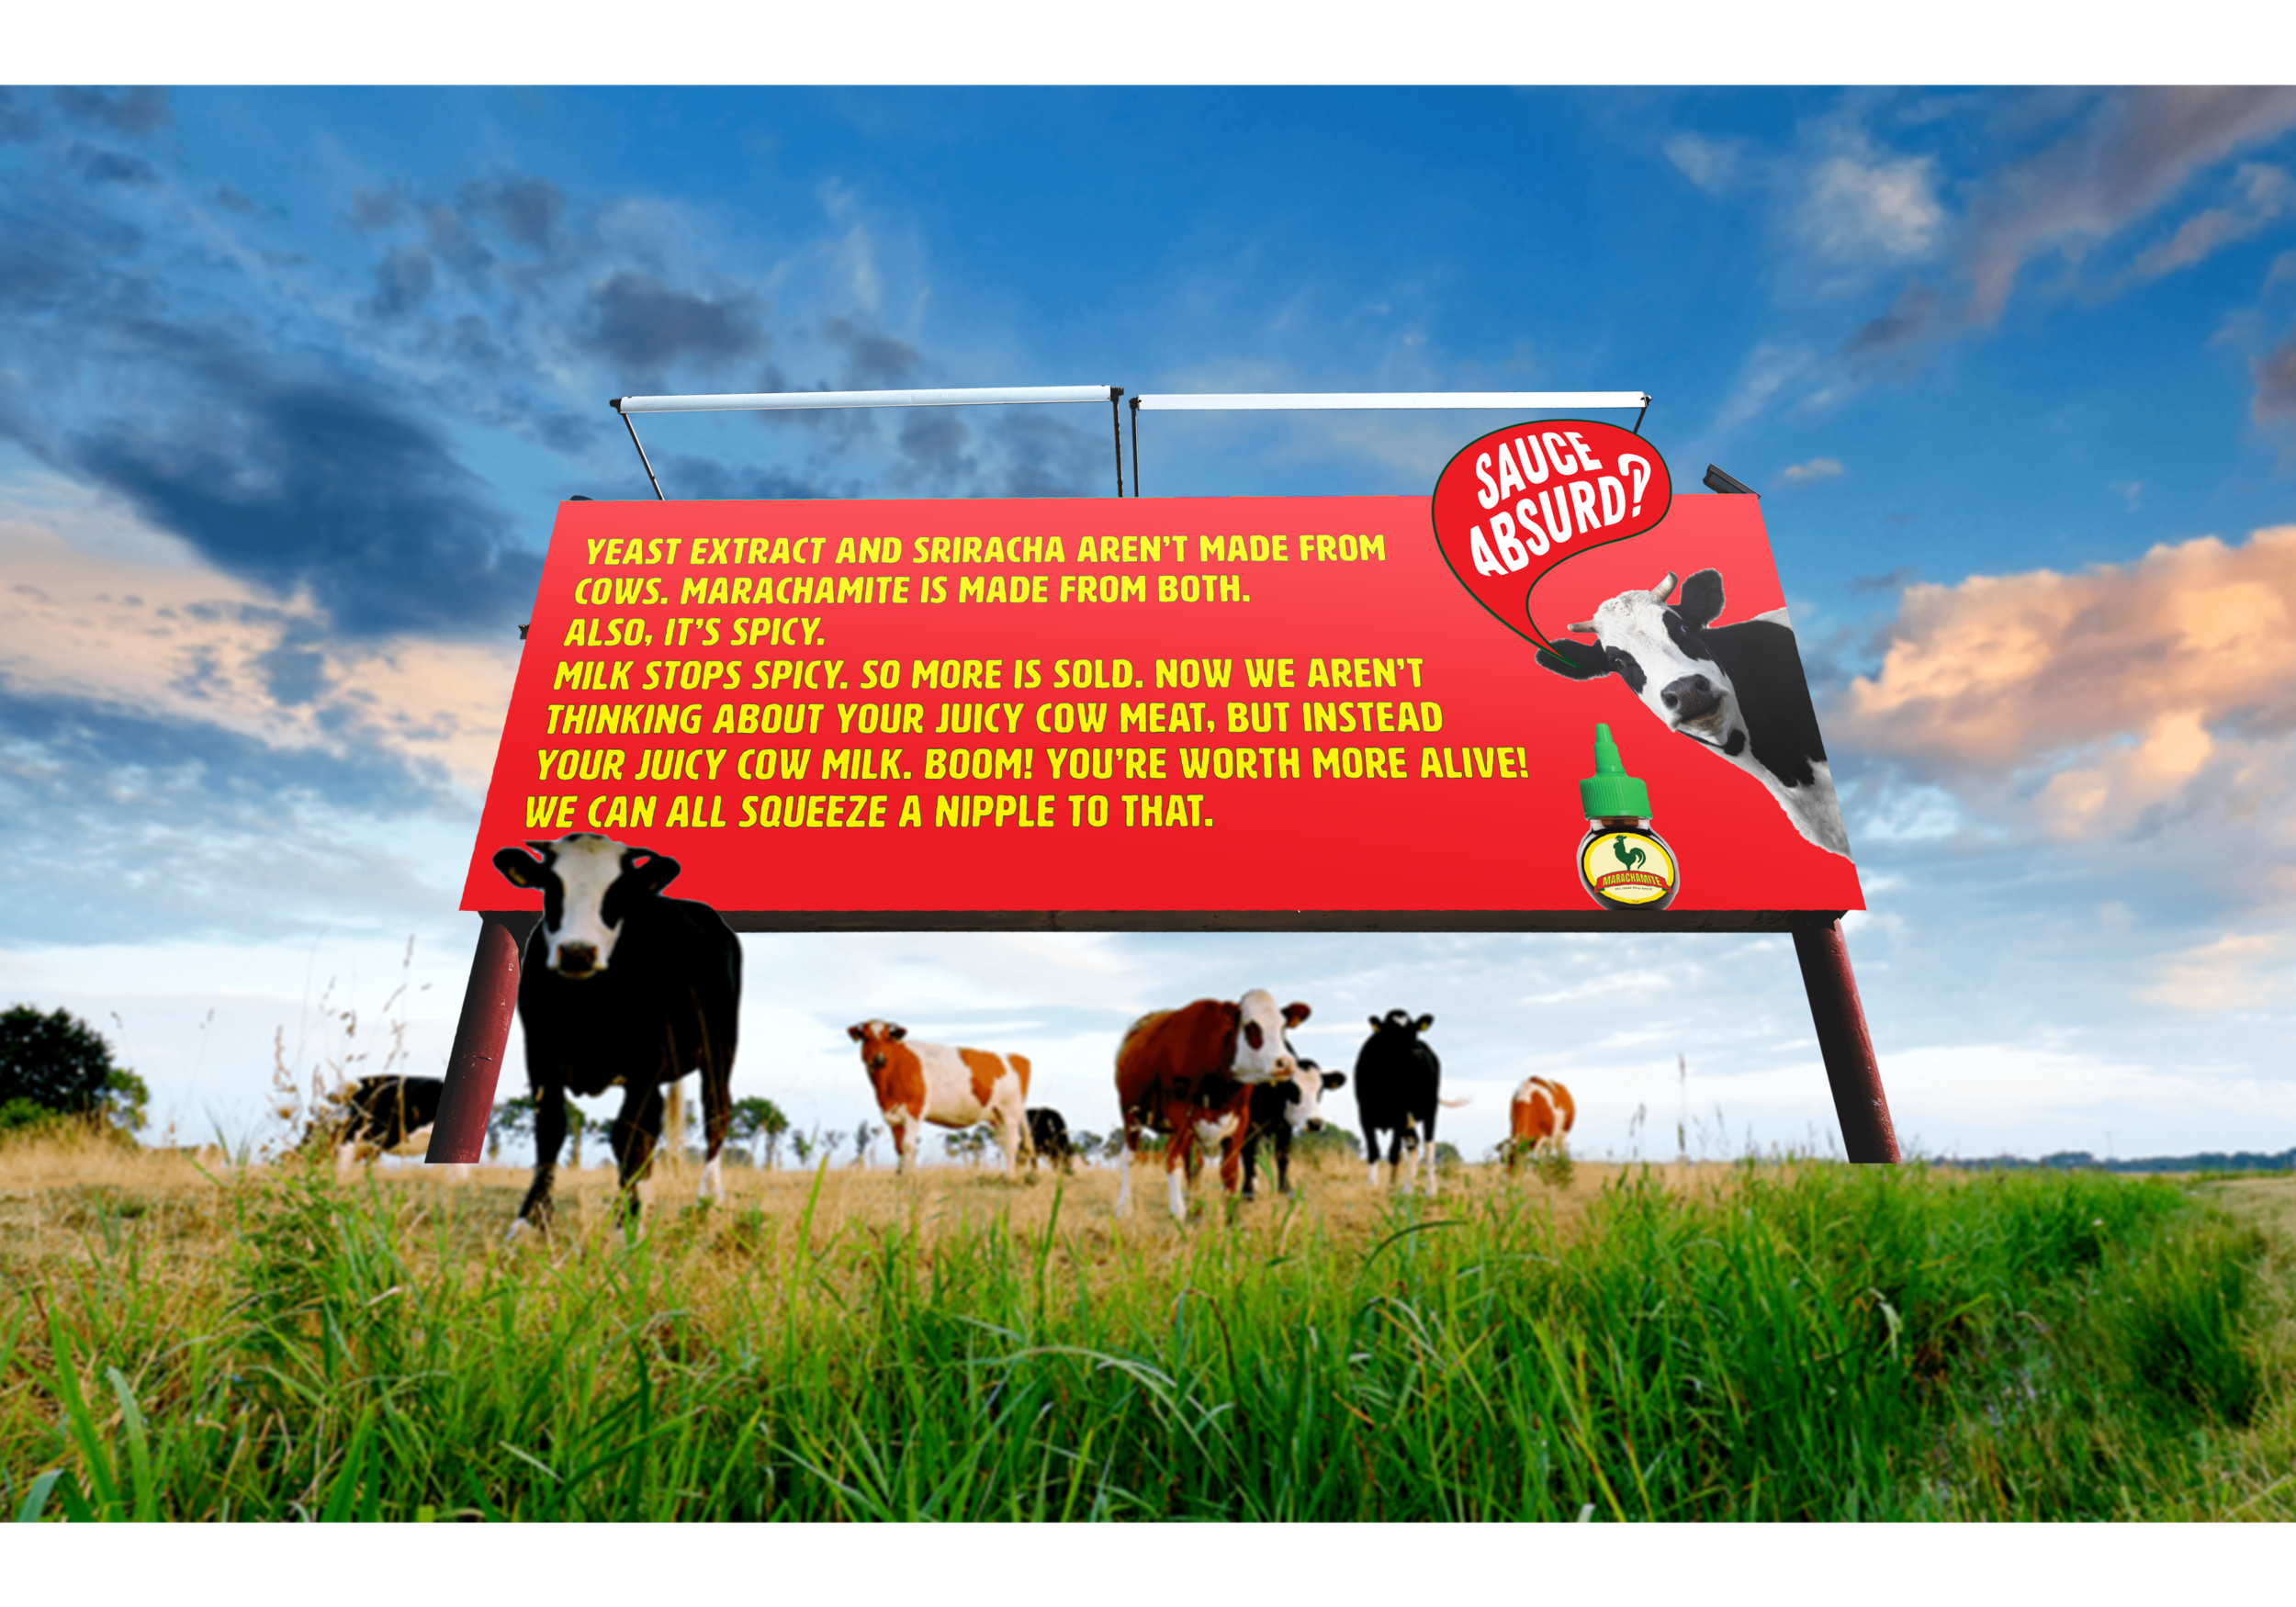 cow_billboard 2.png